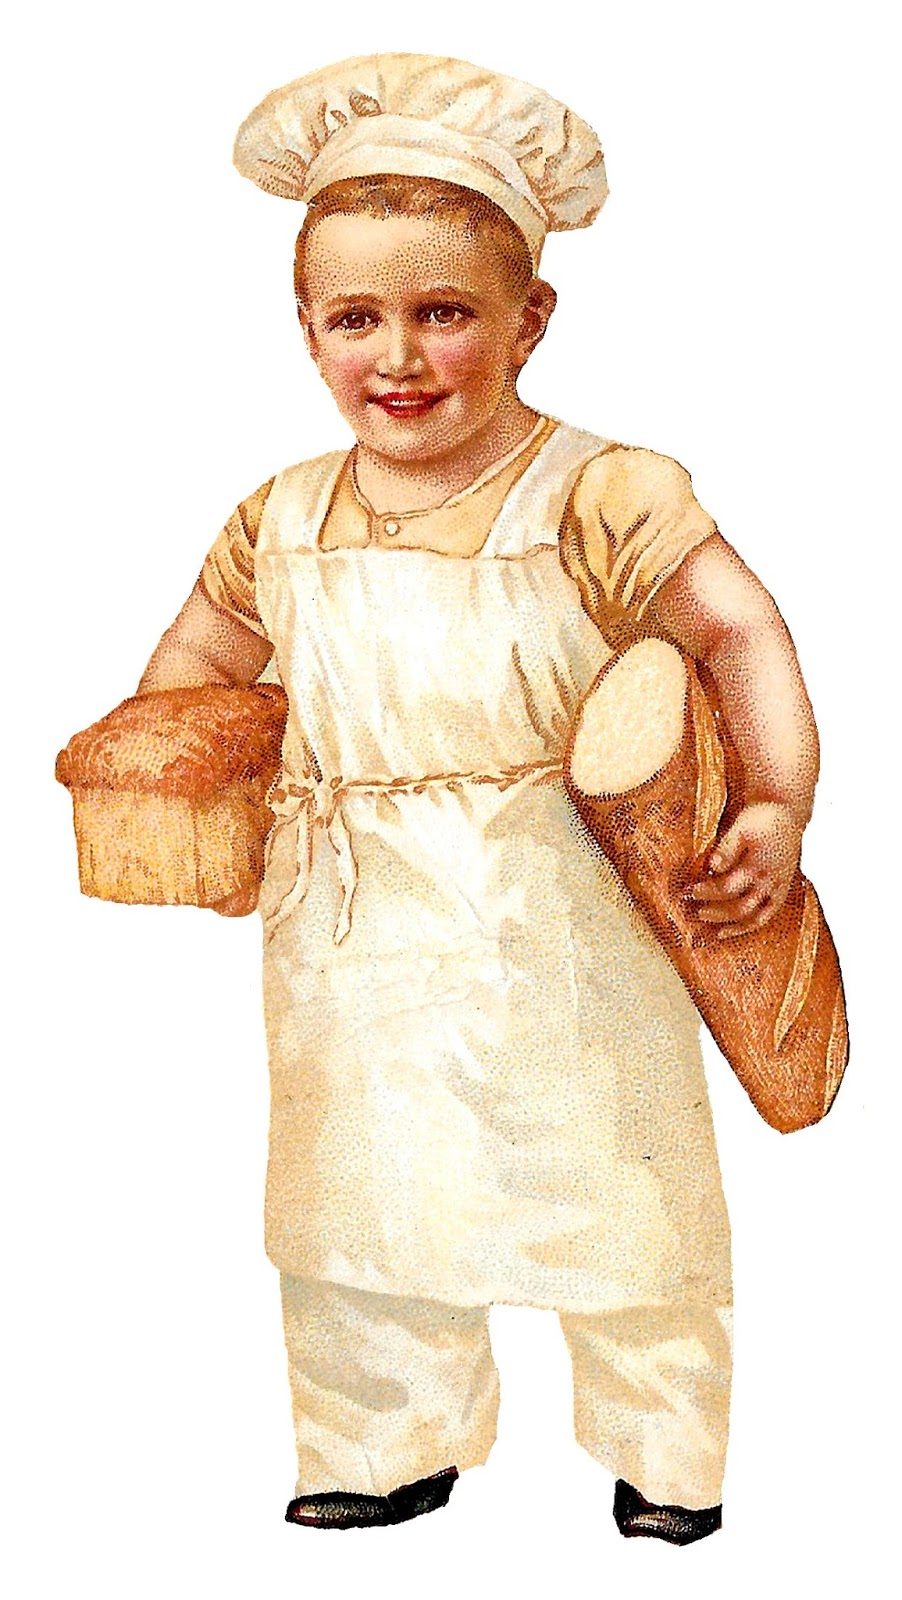 Baker clipart child. Antique images free bread